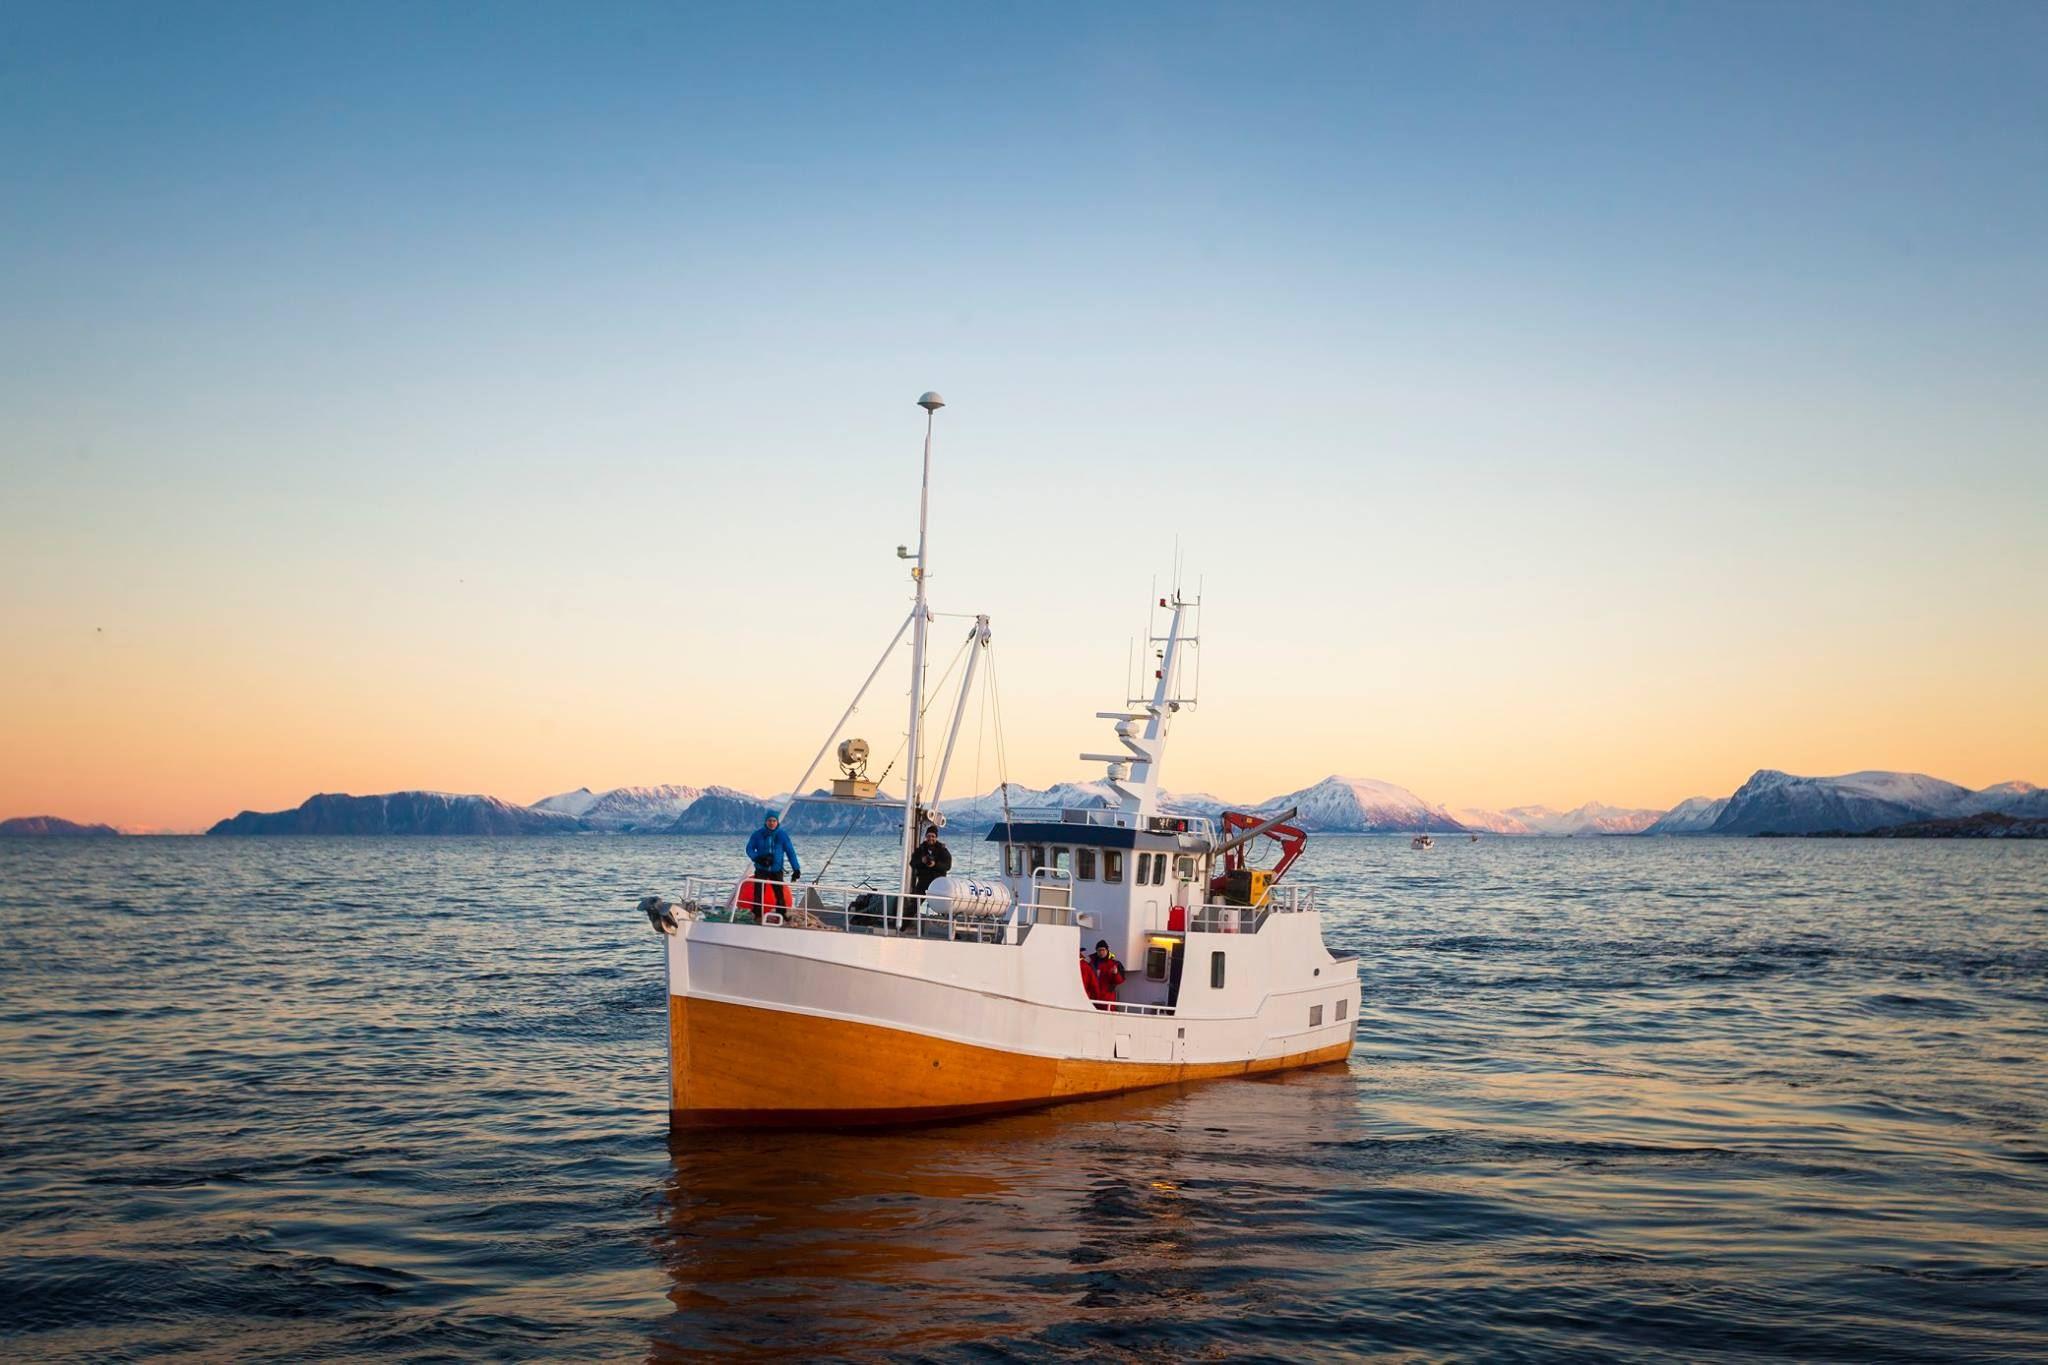 M/S Sjøblomsten, M/S Sjøblomsten – Havfiske